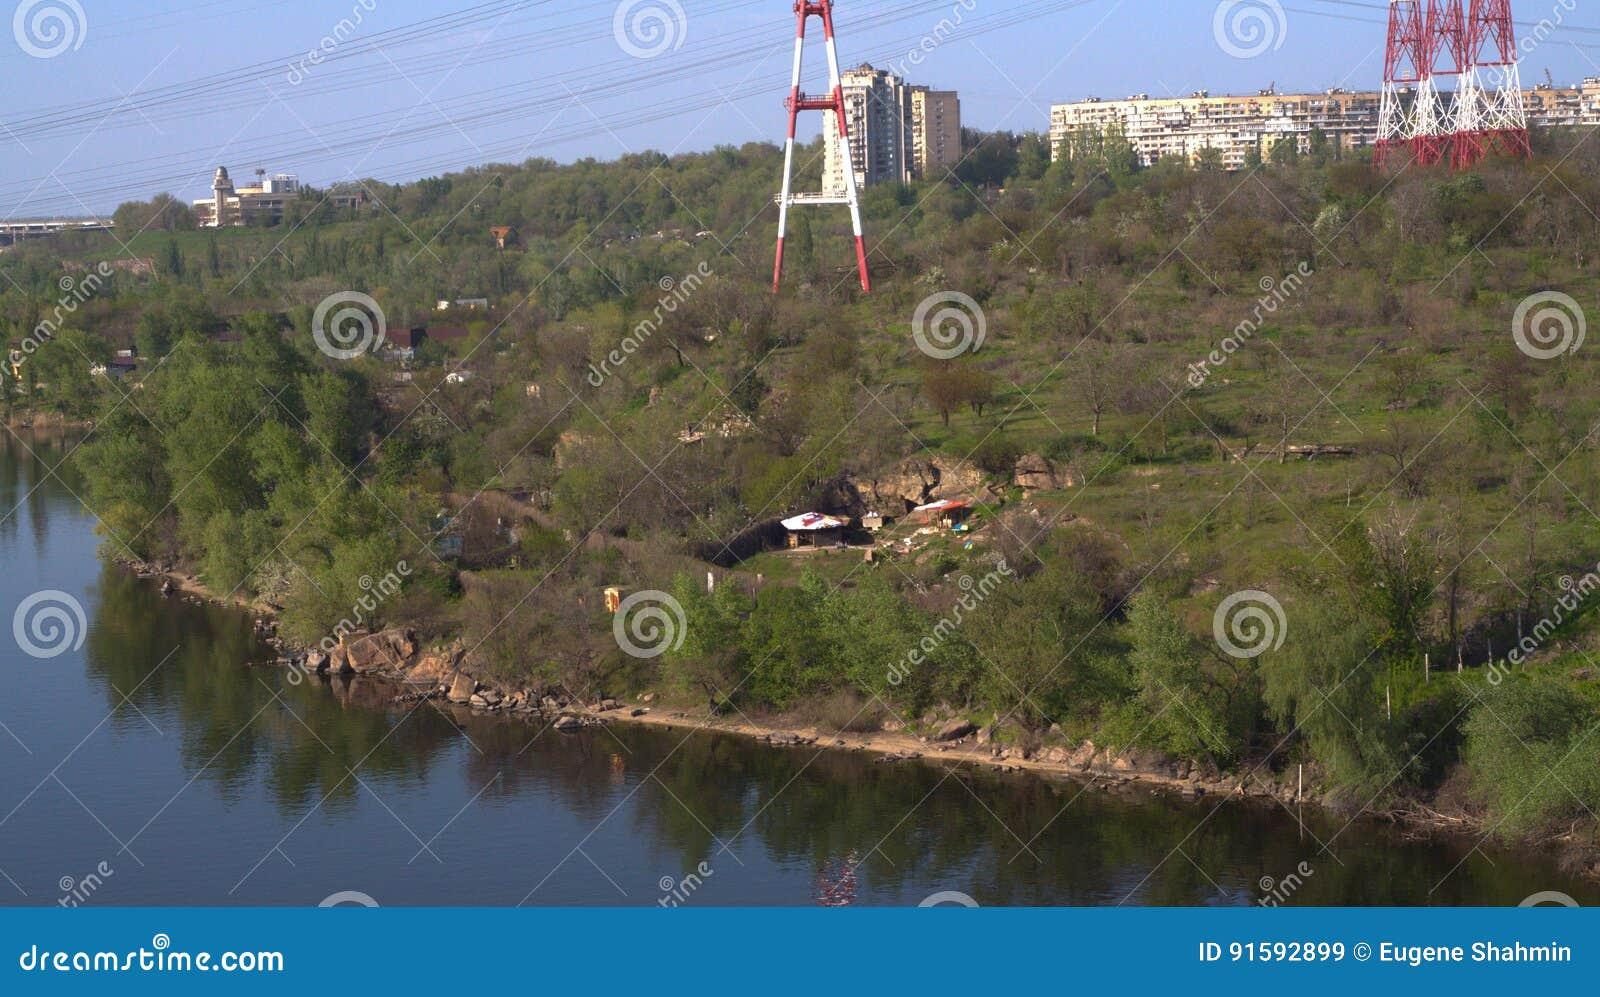 Left bank of Dnepr river.